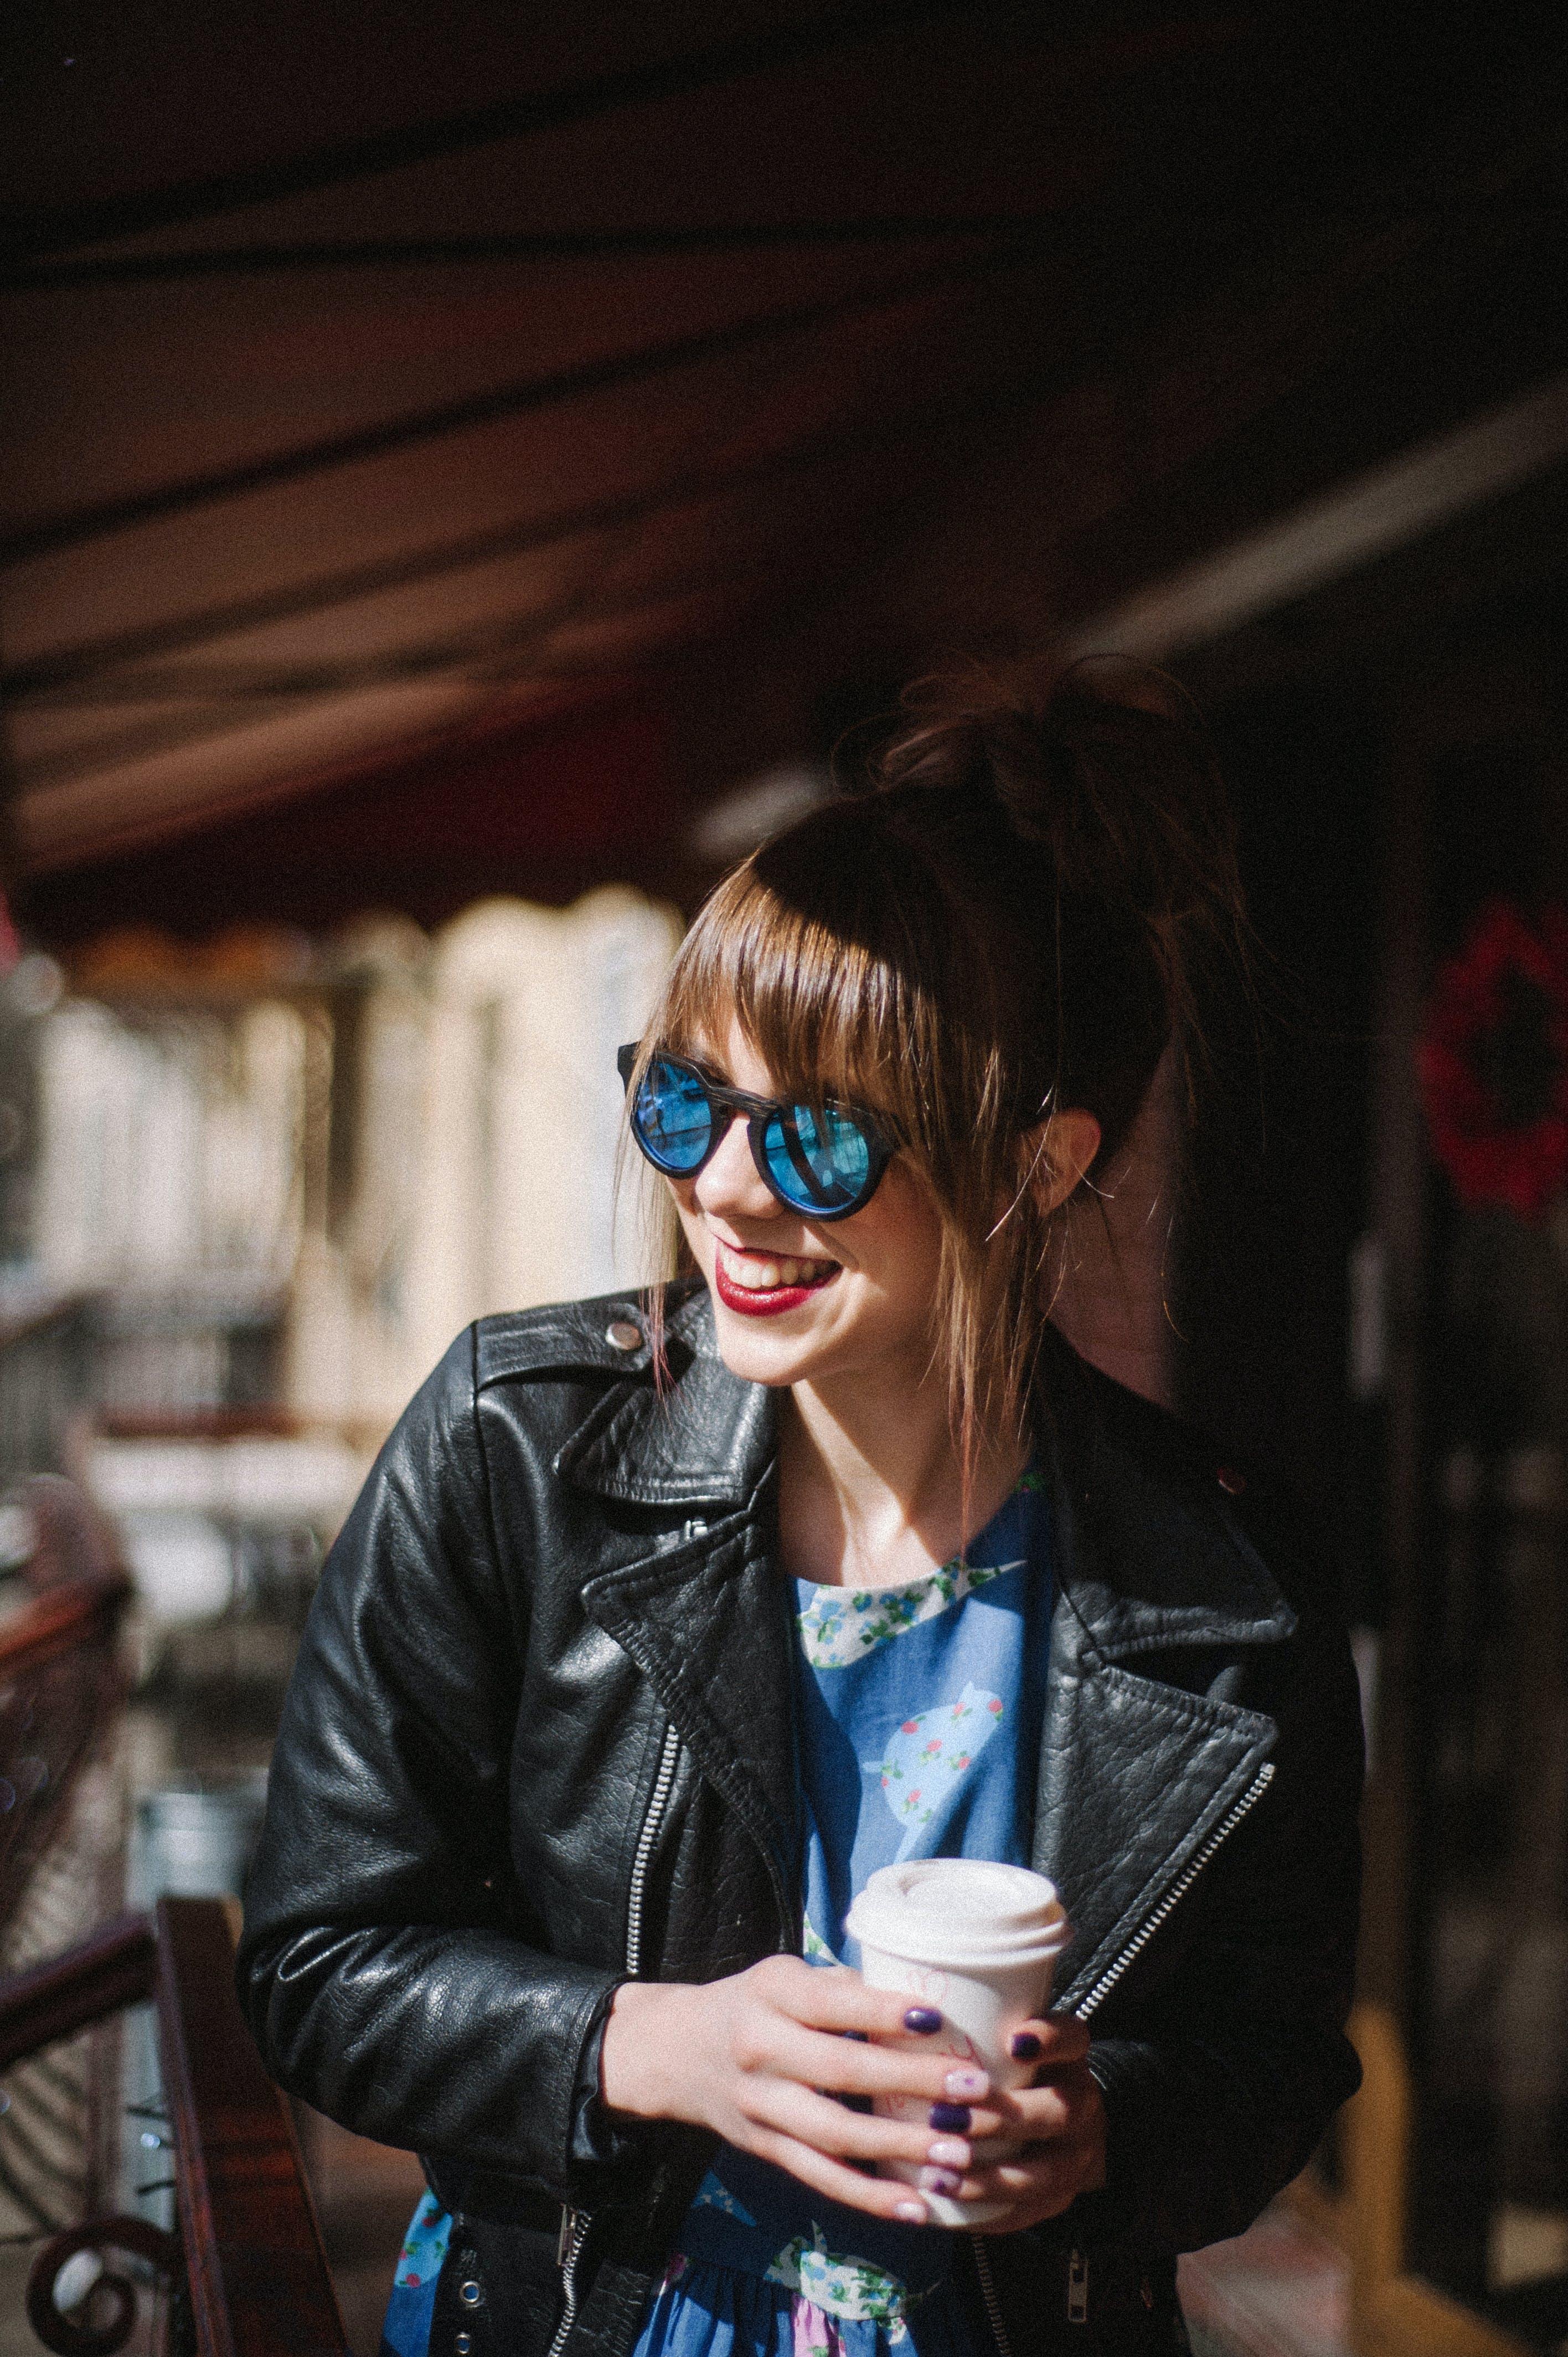 Free stock photo of eye glasses, girl, happy, jeans